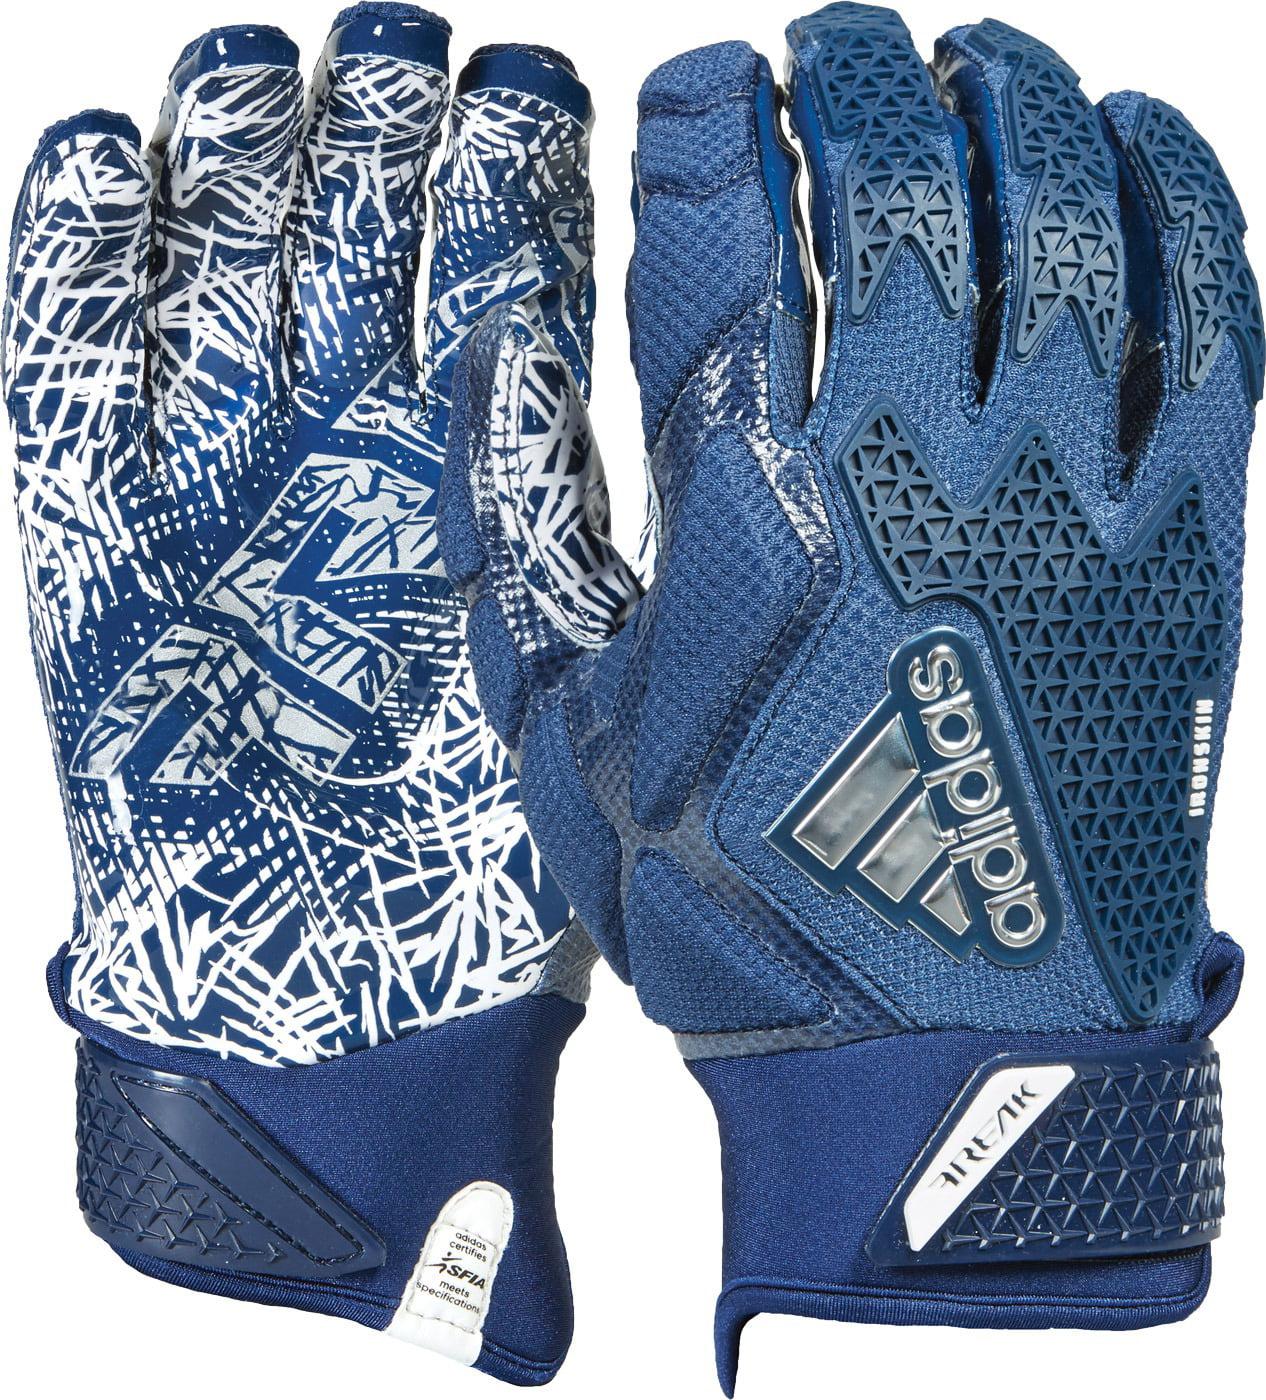 Adidas Freak 3.0 Adult Football Padded Receiver/Linebacke...